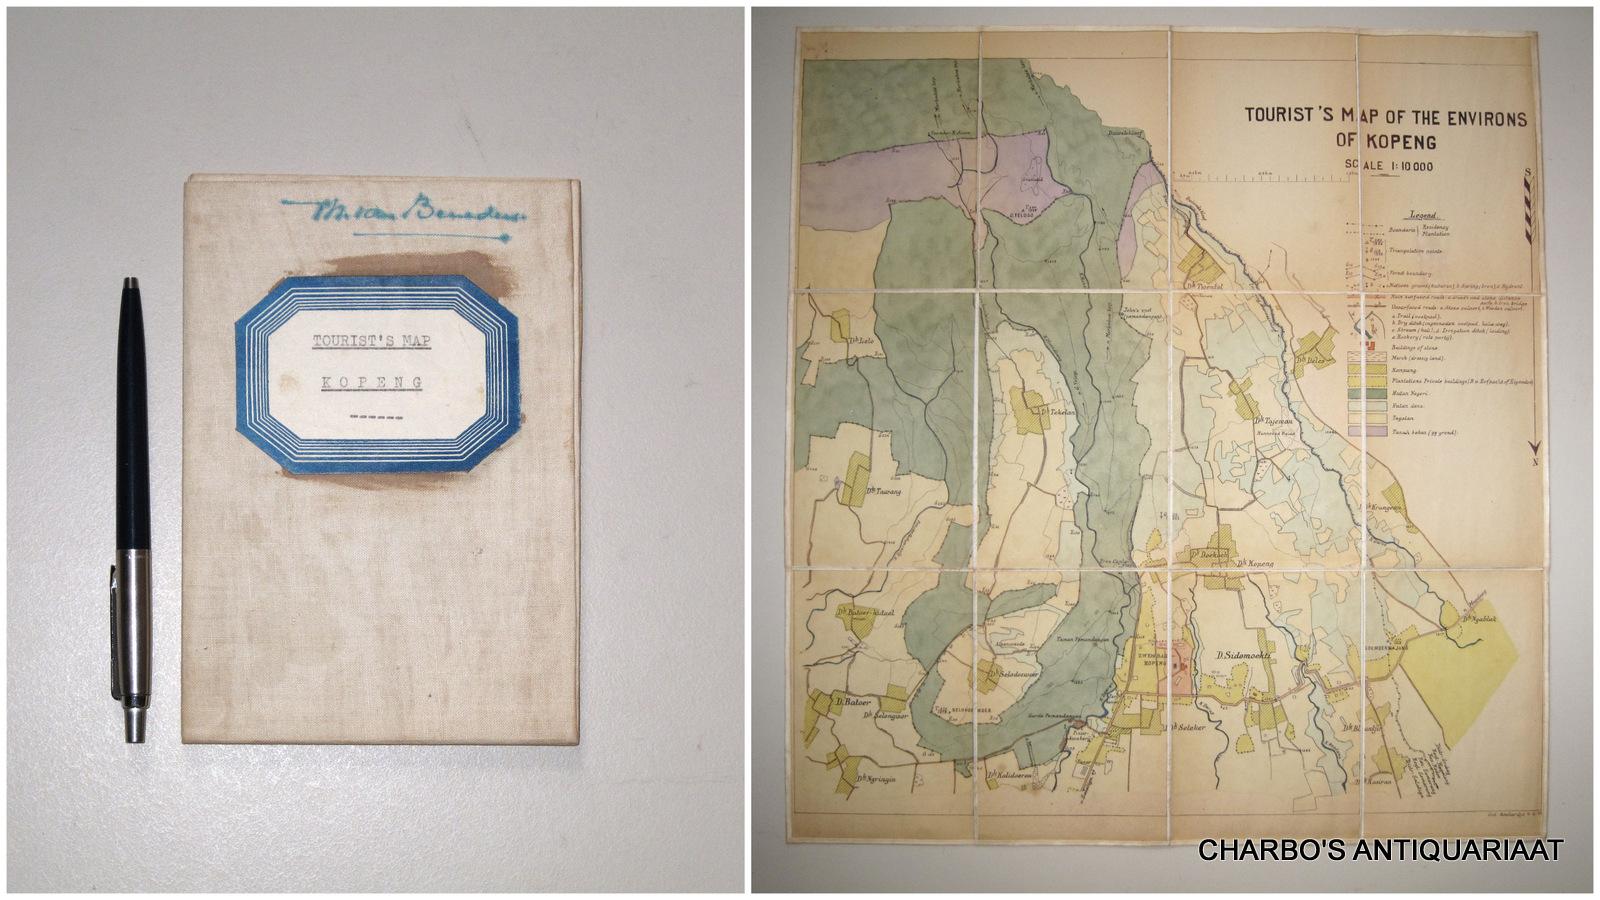 SOETARDJO, -  Tourist's map of the environs of Kopeng. Scale 1:10000.